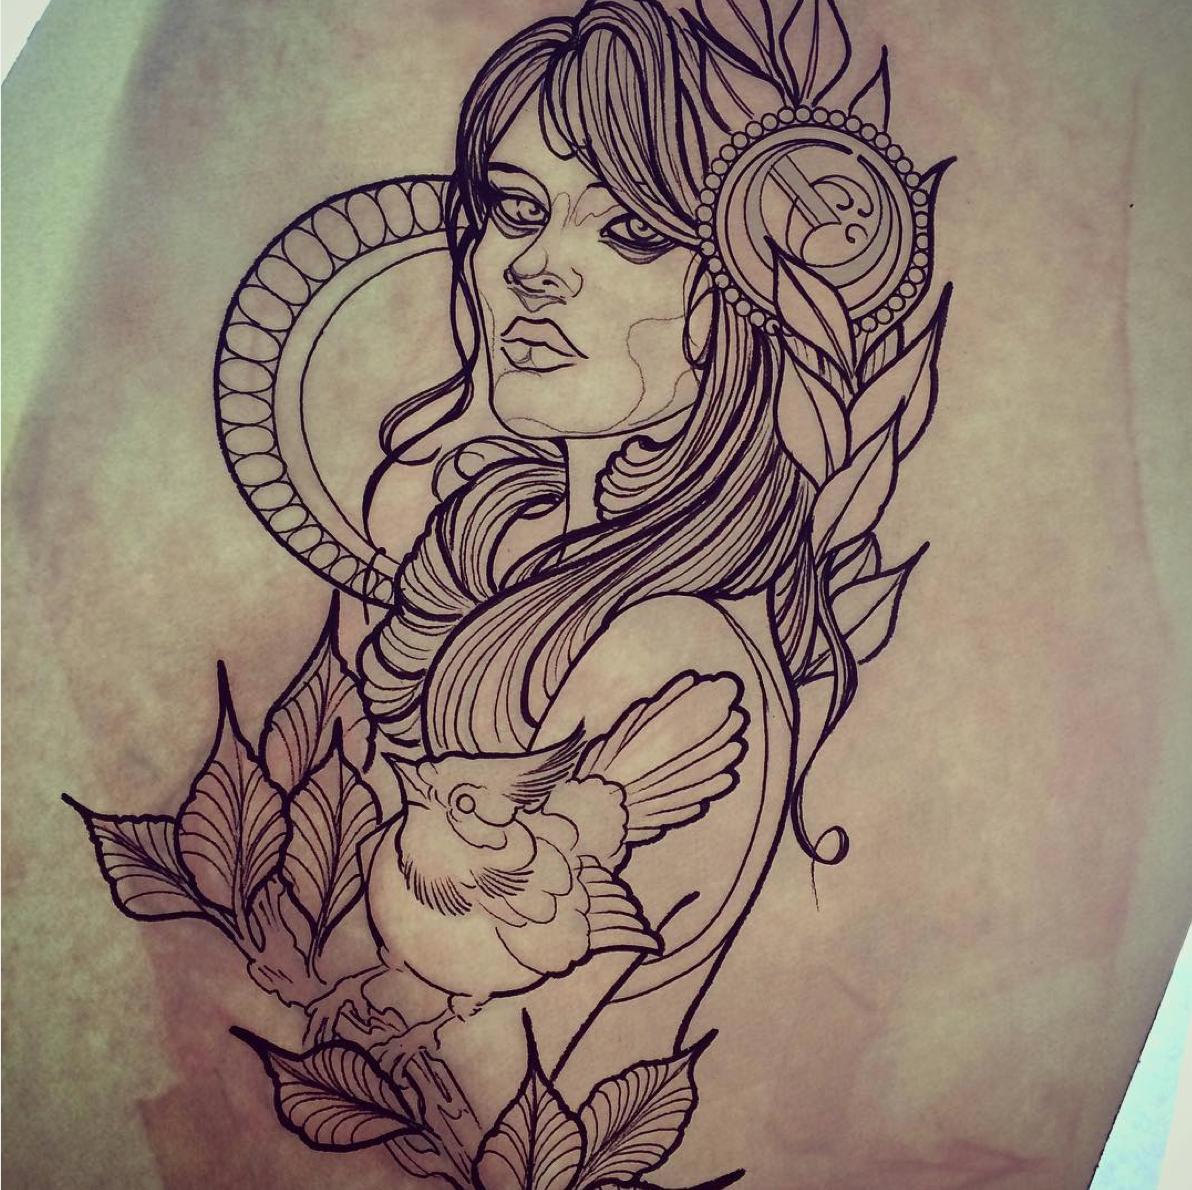 Illustration Woman Woman Girl Neotraditionel Neotraditional Neo Traditionel Draw Drawing Tatt Tattoo Drawings Tattoos For Women Neo Traditional Tattoo